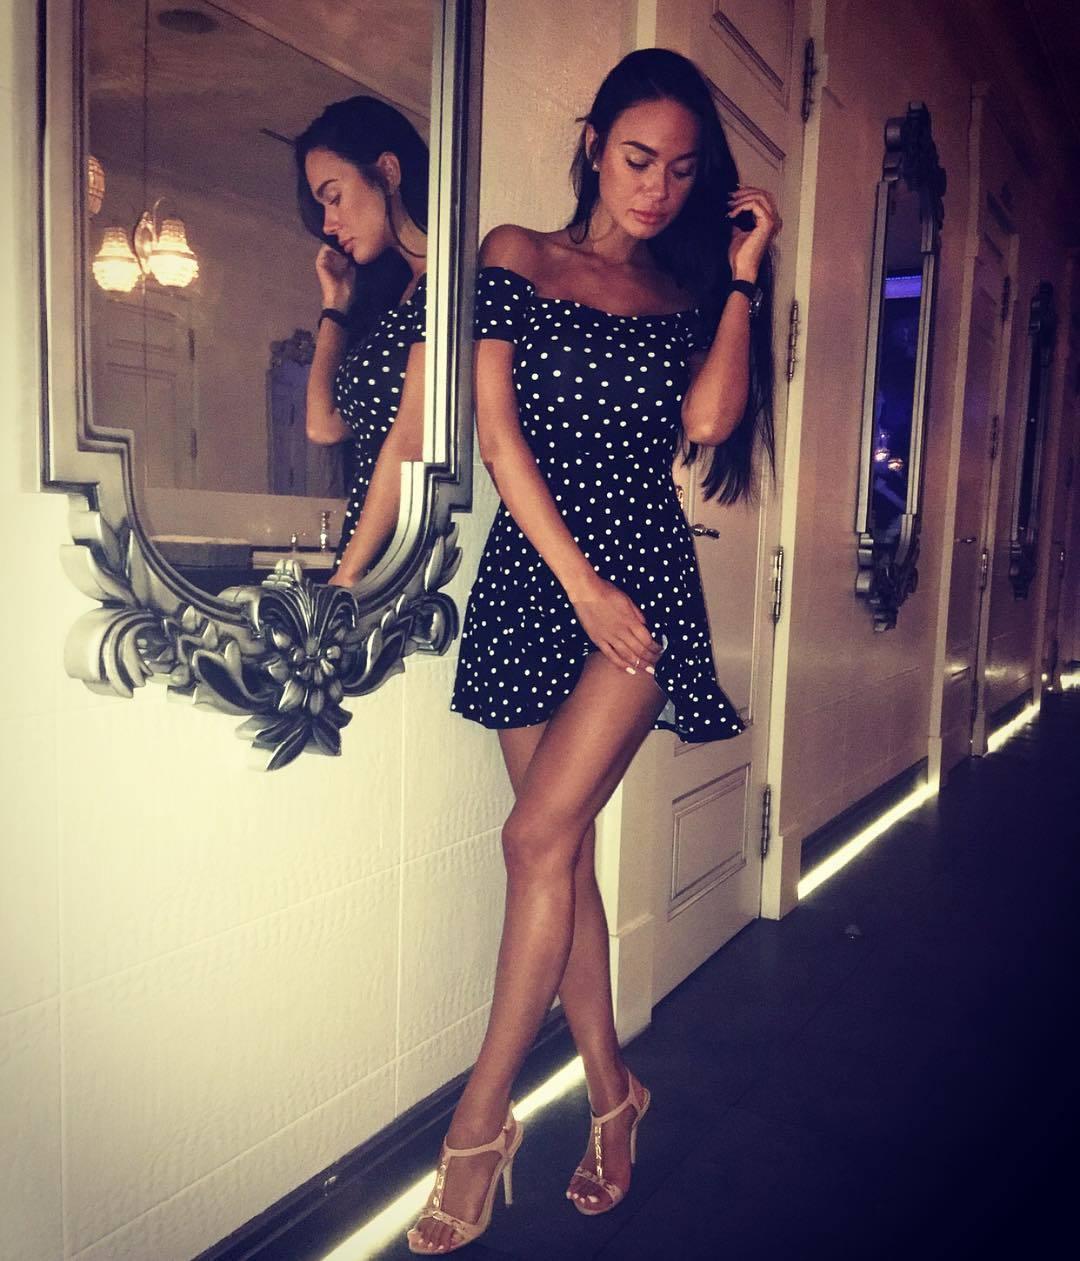 Yana Koshkina nudes (24 photo), Tits, Cleavage, Instagram, cameltoe 2017